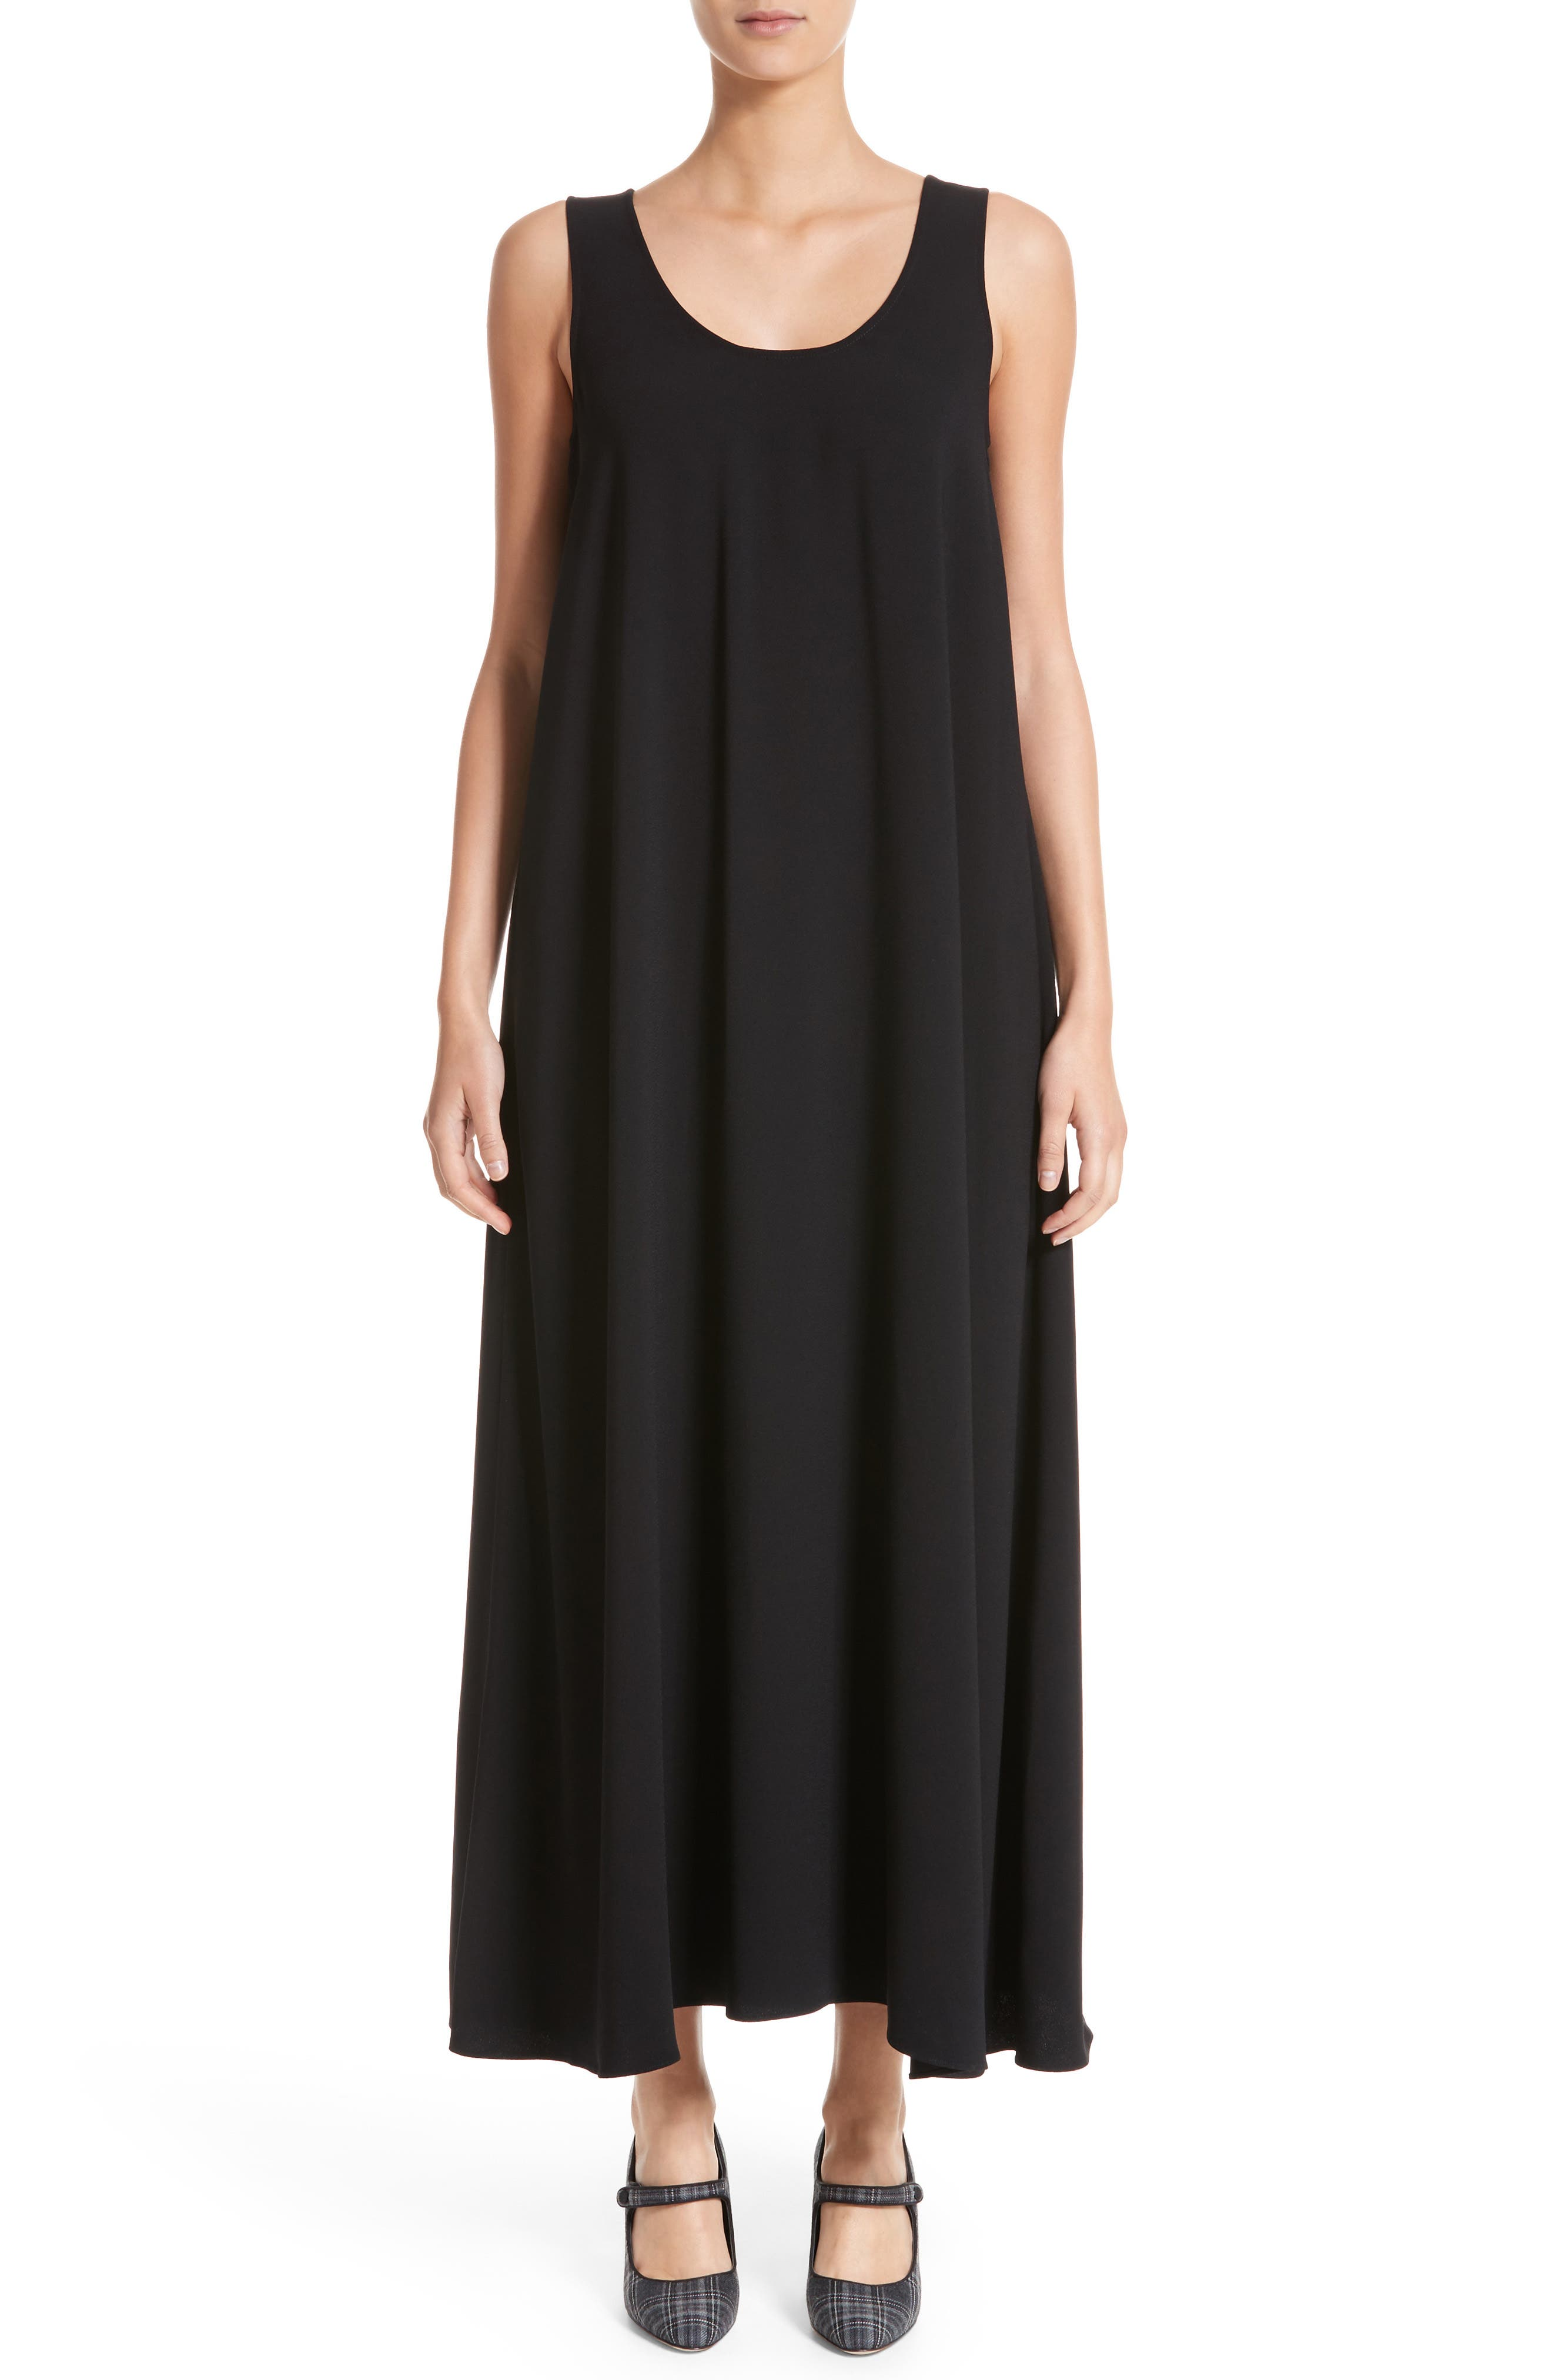 Alternate Image 1 Selected - Co Sleeveless Maxi Dress